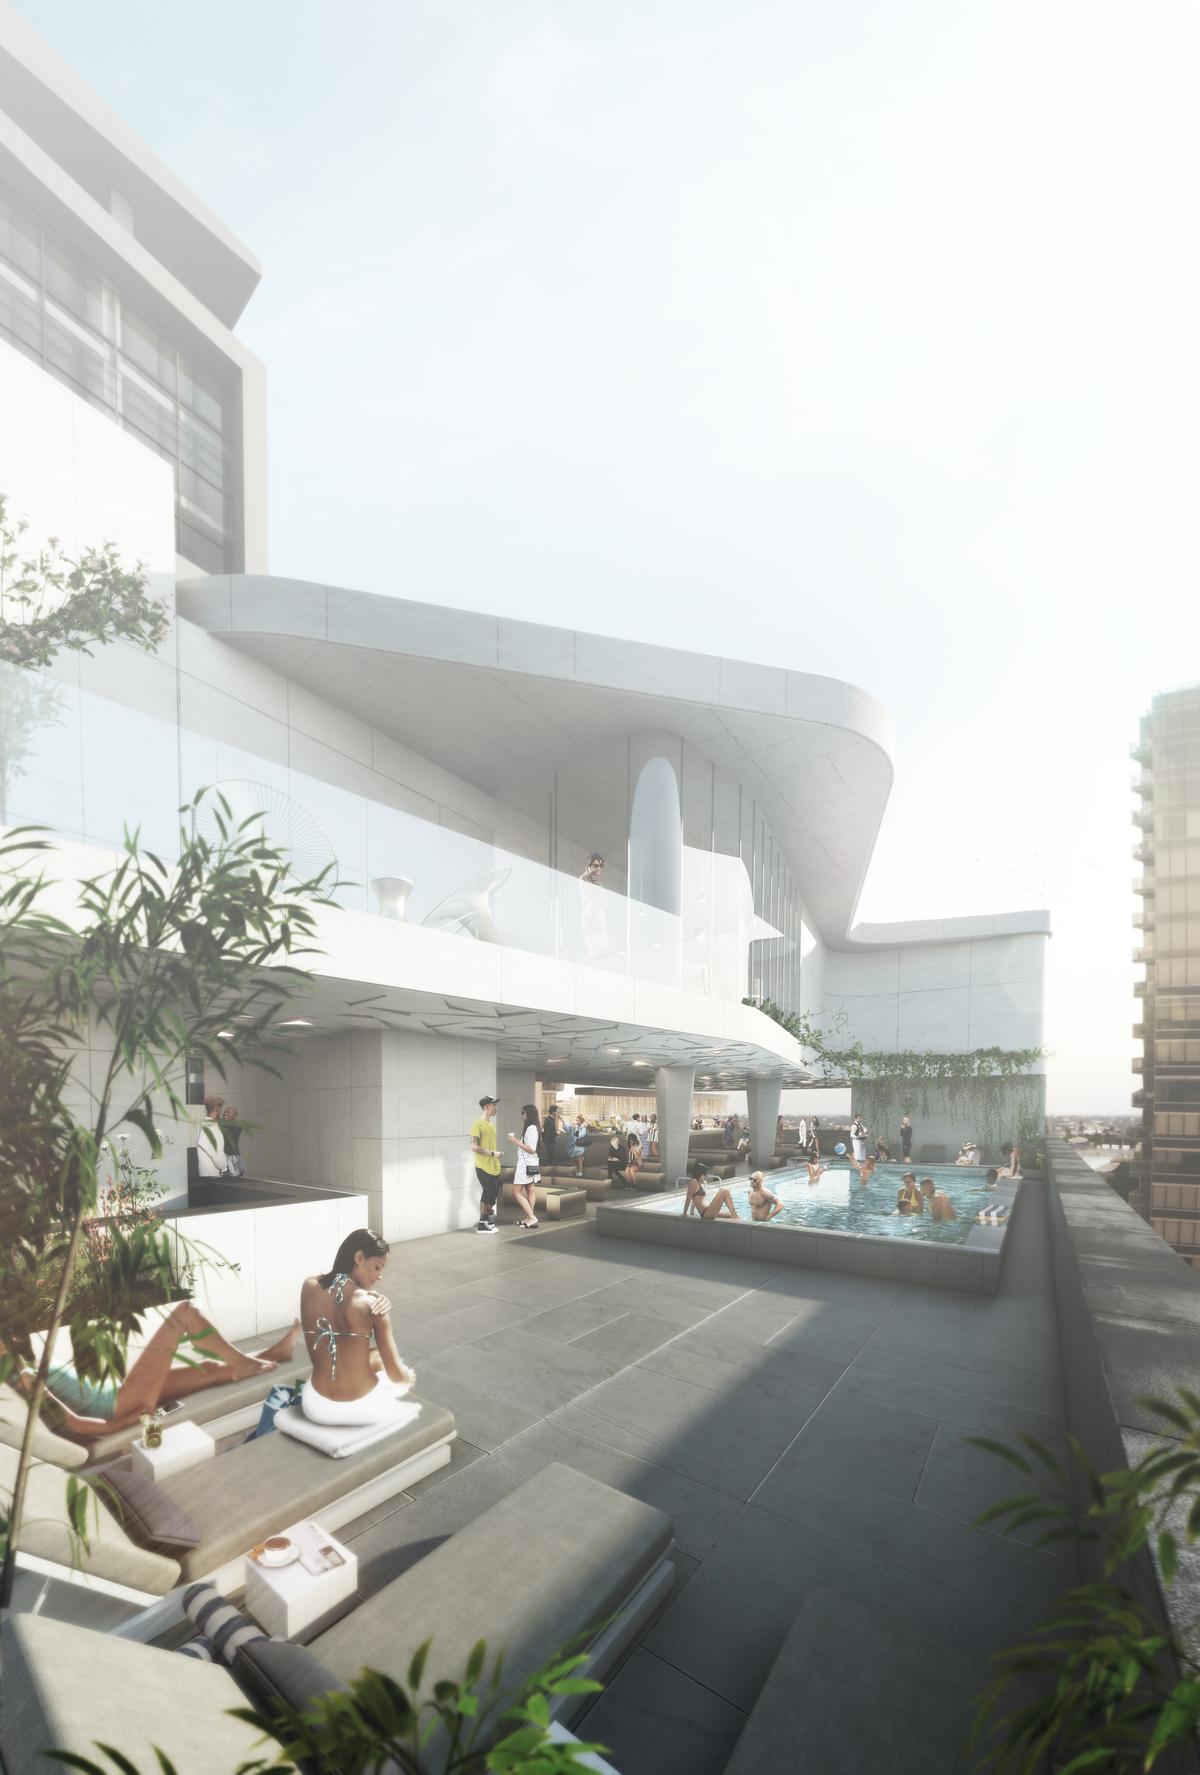 Hotel No. 1. Image Credit: Mode Machine.